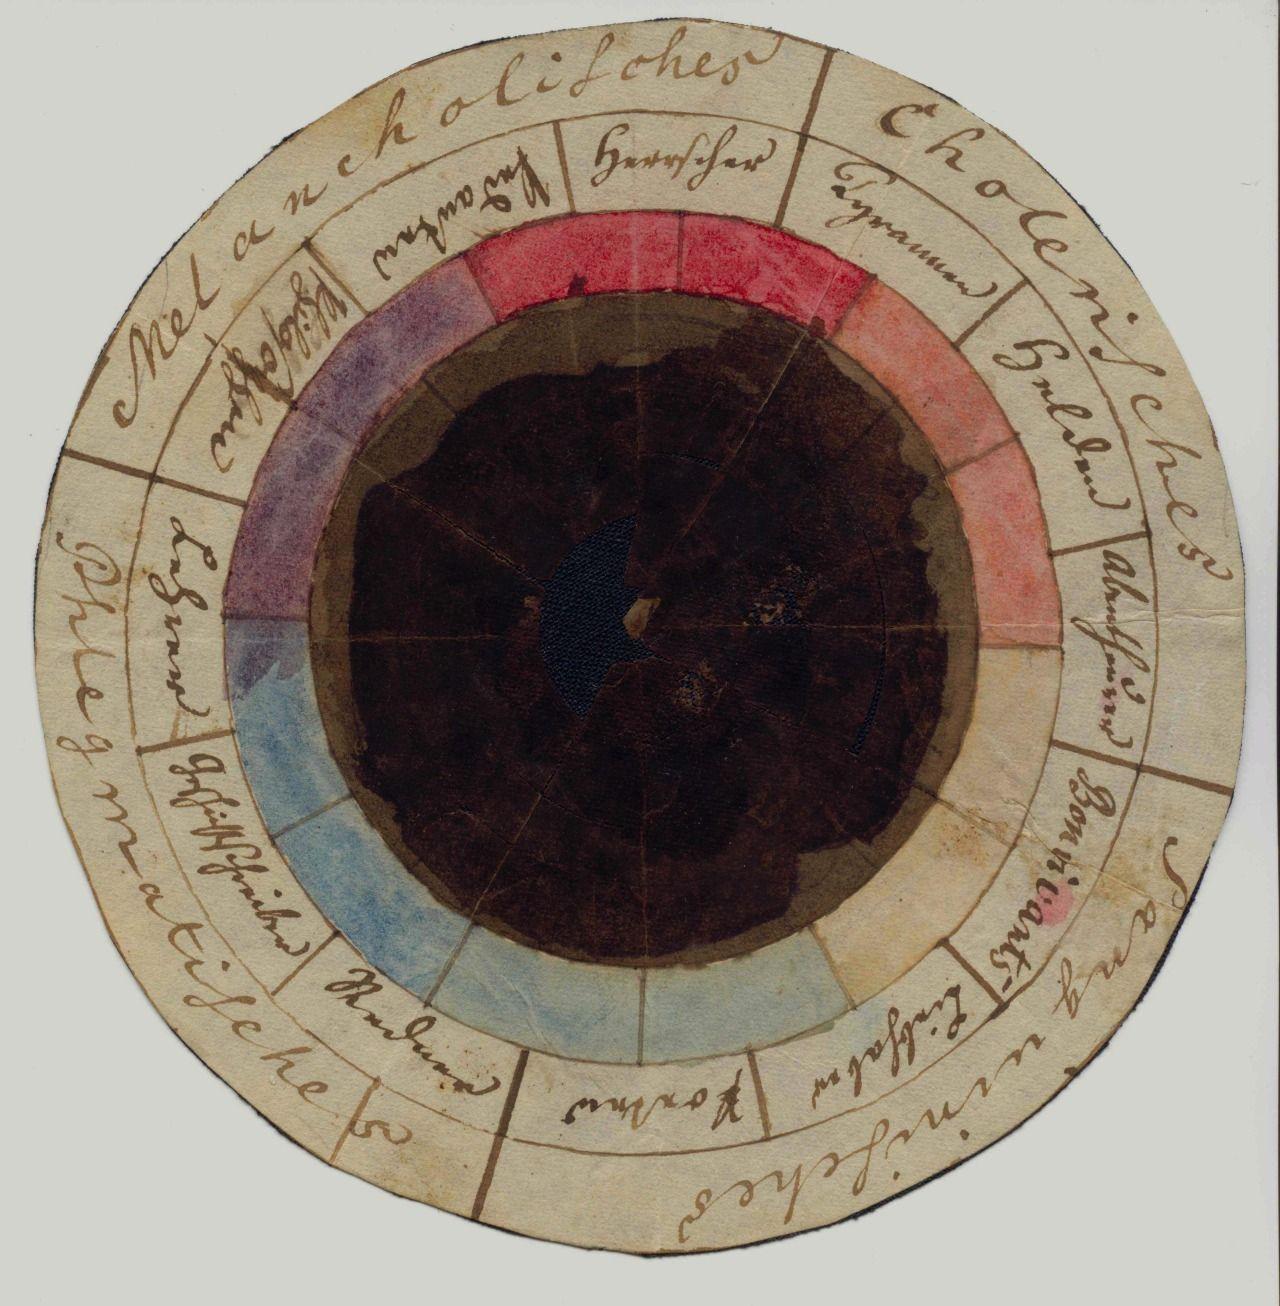 Johann von Goethe Colour Theory 1810   Colour Lover   Muestrario de colores, Color, Acuarela